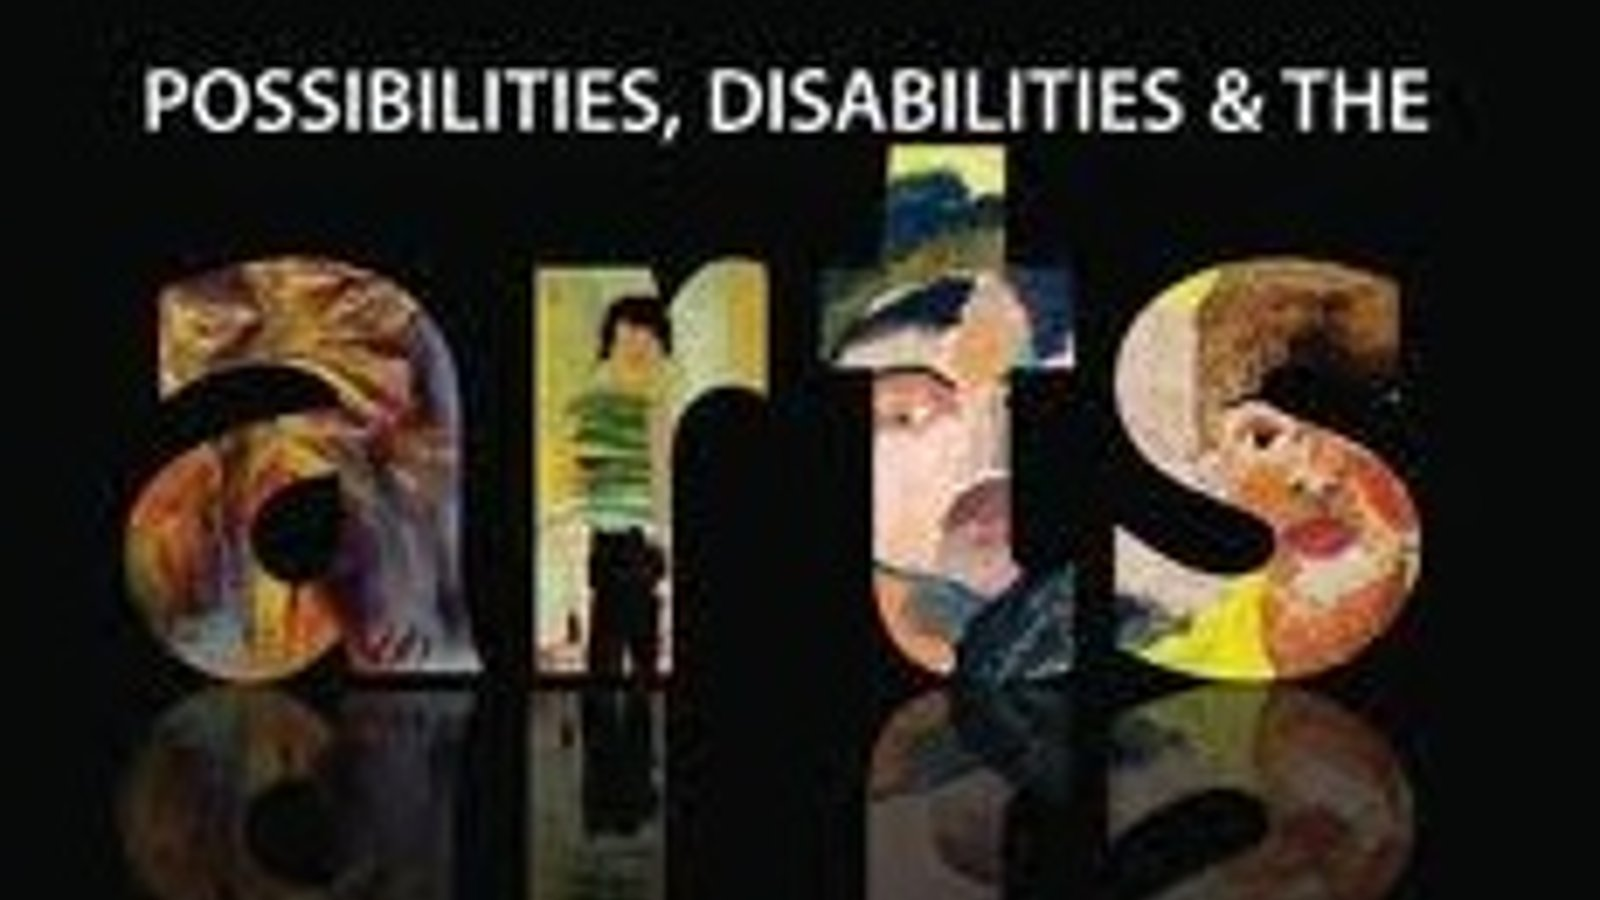 ARTS: Possibilities, Disabilities & The Arts